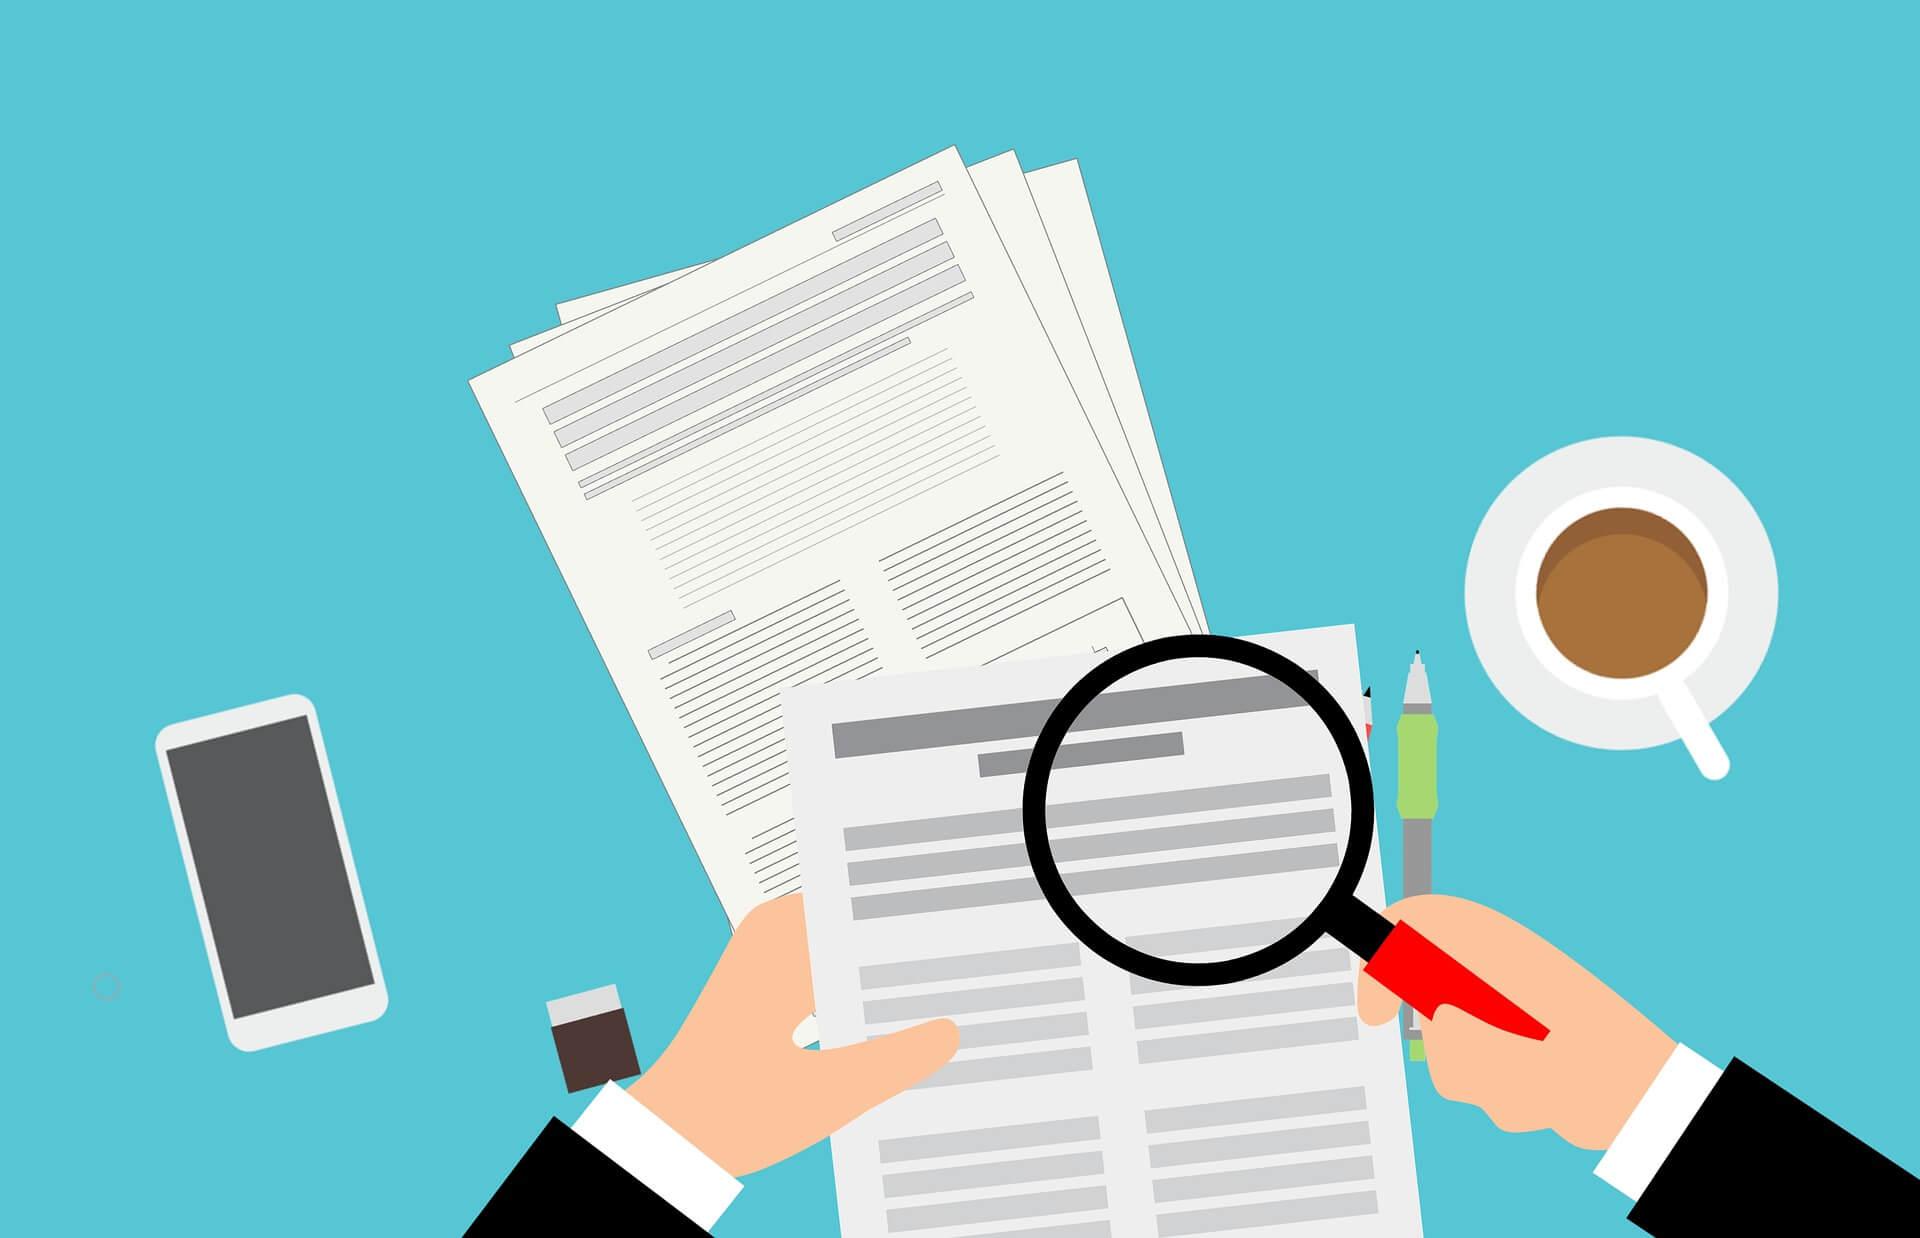 Top 5 Verification Methods to Improve Customer Verification - Insights